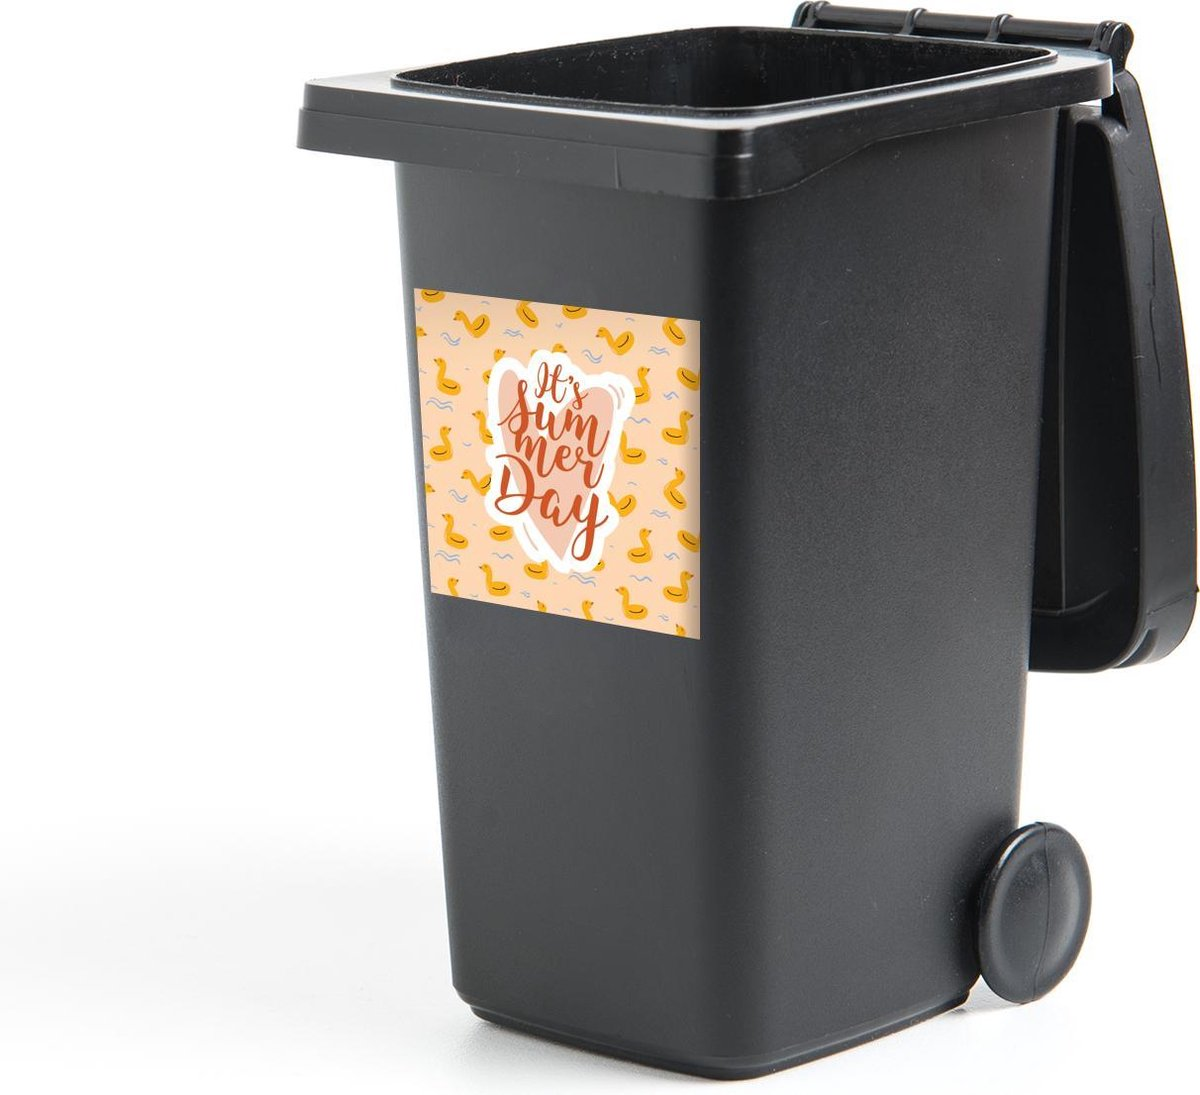 Container sticker Zwemband - Roze - Geel - 40x40 cm - Kliko sticker